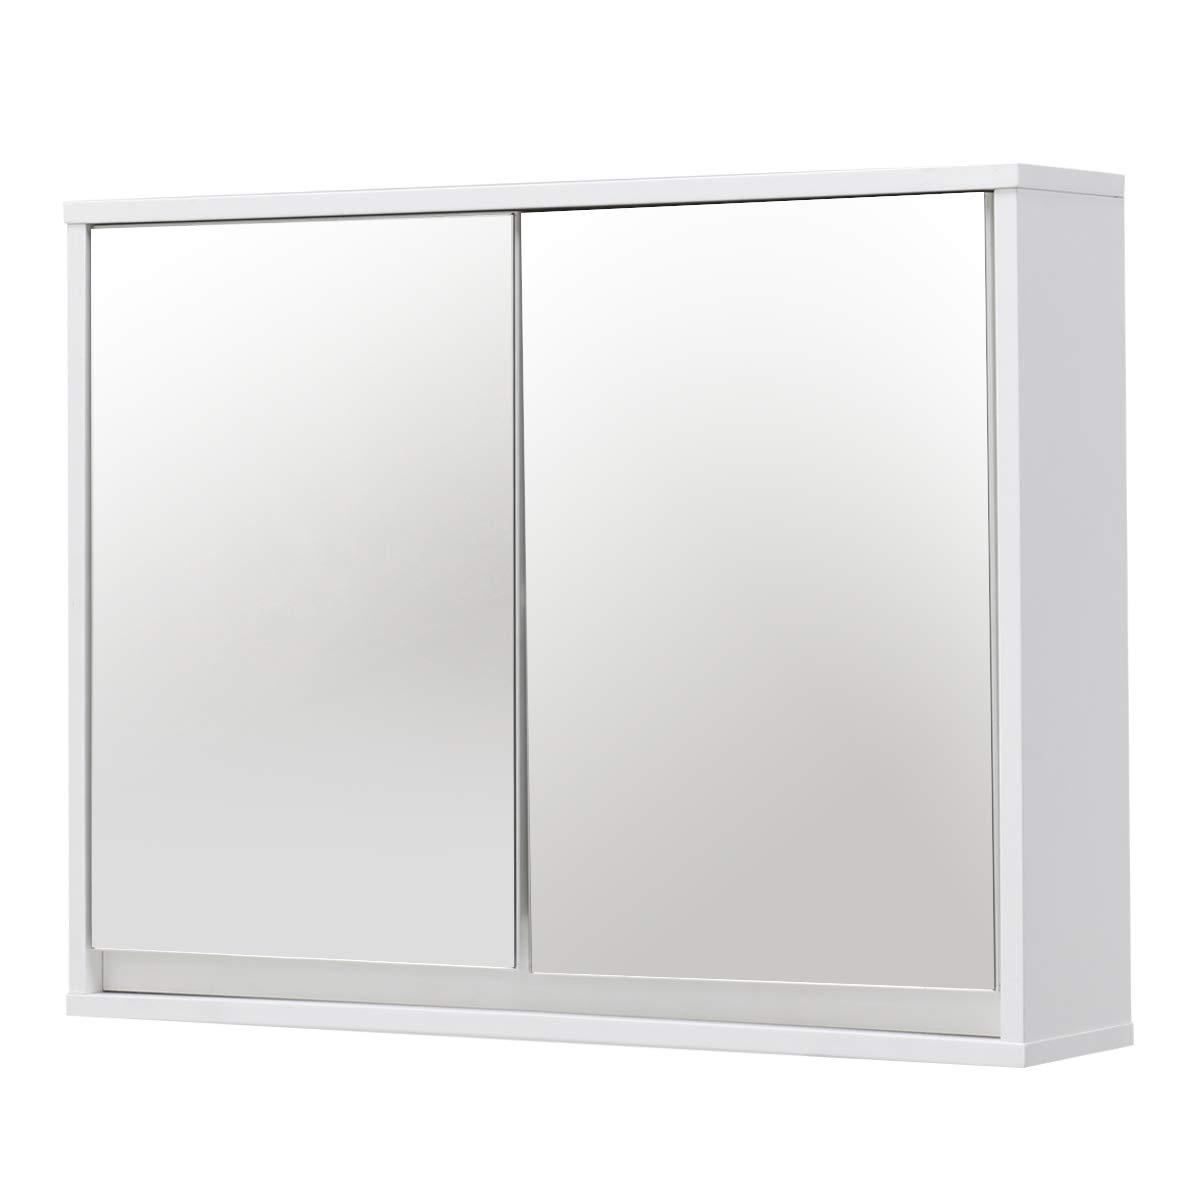 TANGKULA 22'' Wide Wall Mounted Mirror Cabinet Bathroom Medicine Cabinet Double Doors Storage Organizer Shelf Bathroom Cabinet Double Mirror Door Wall Mount Storage Wood Shelf White (22'' Wood Shelf)